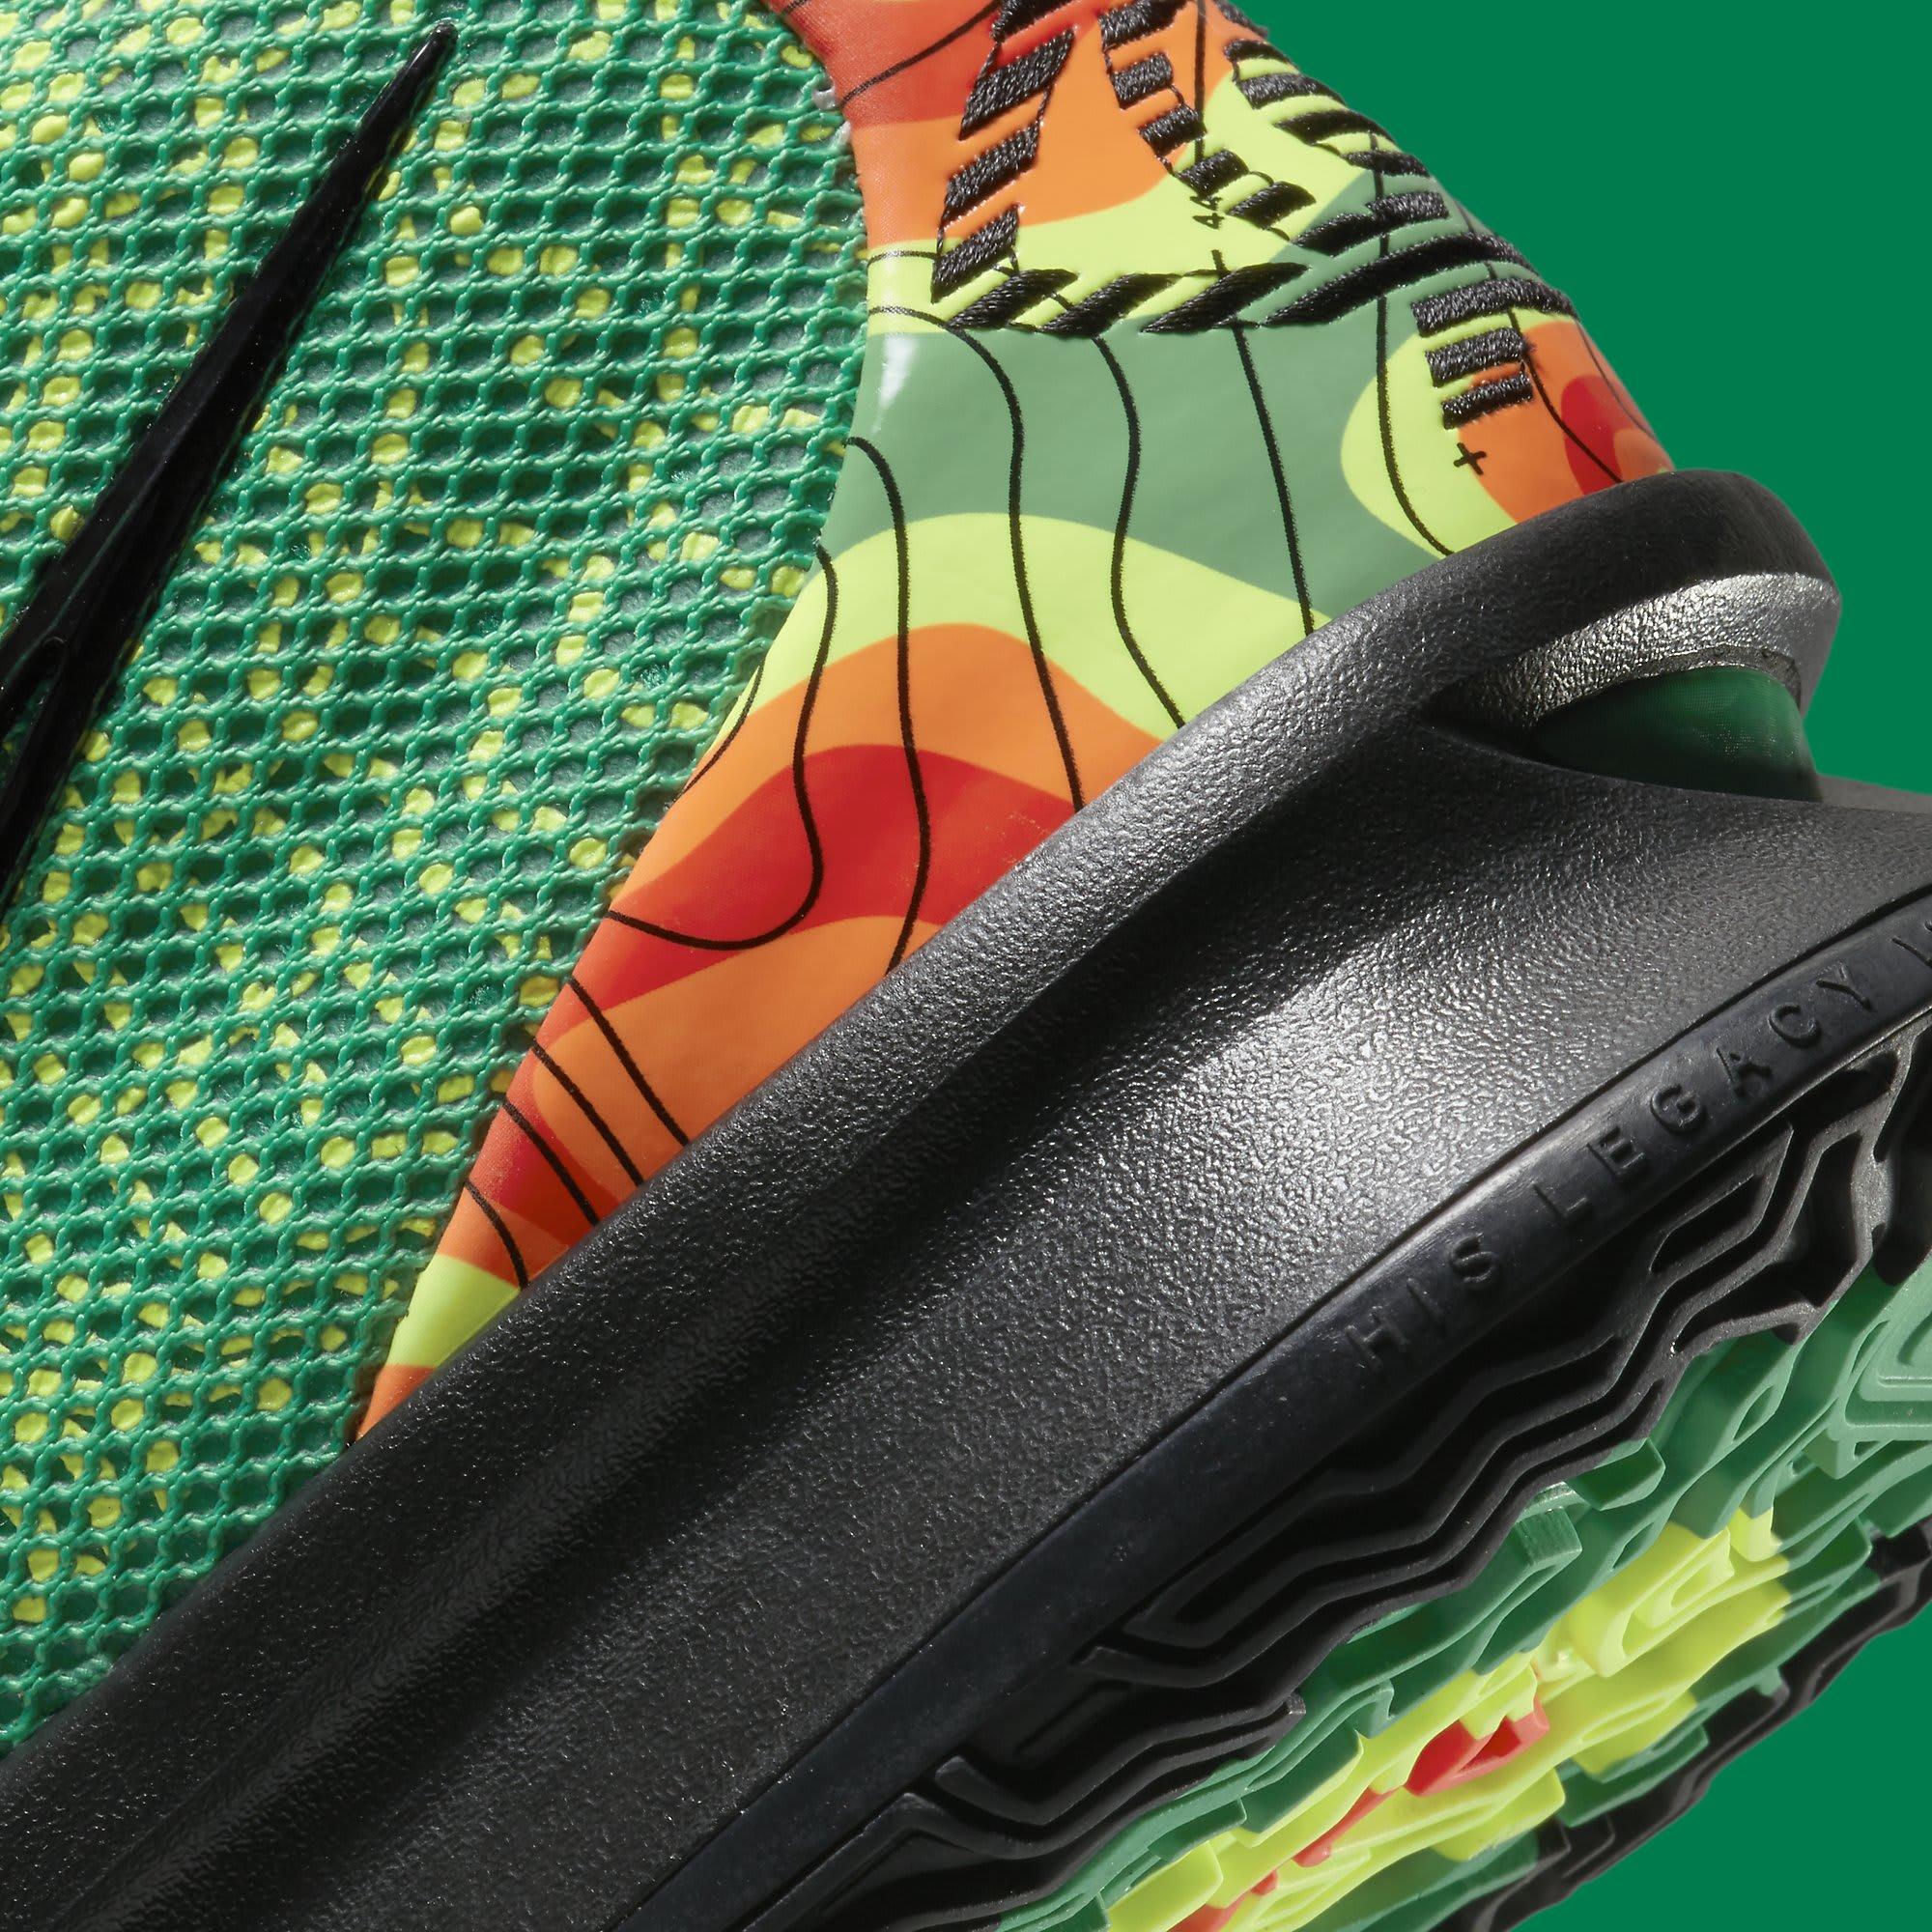 Nike Kyrie 7 'Weatherman' CQ9327-300 Heel